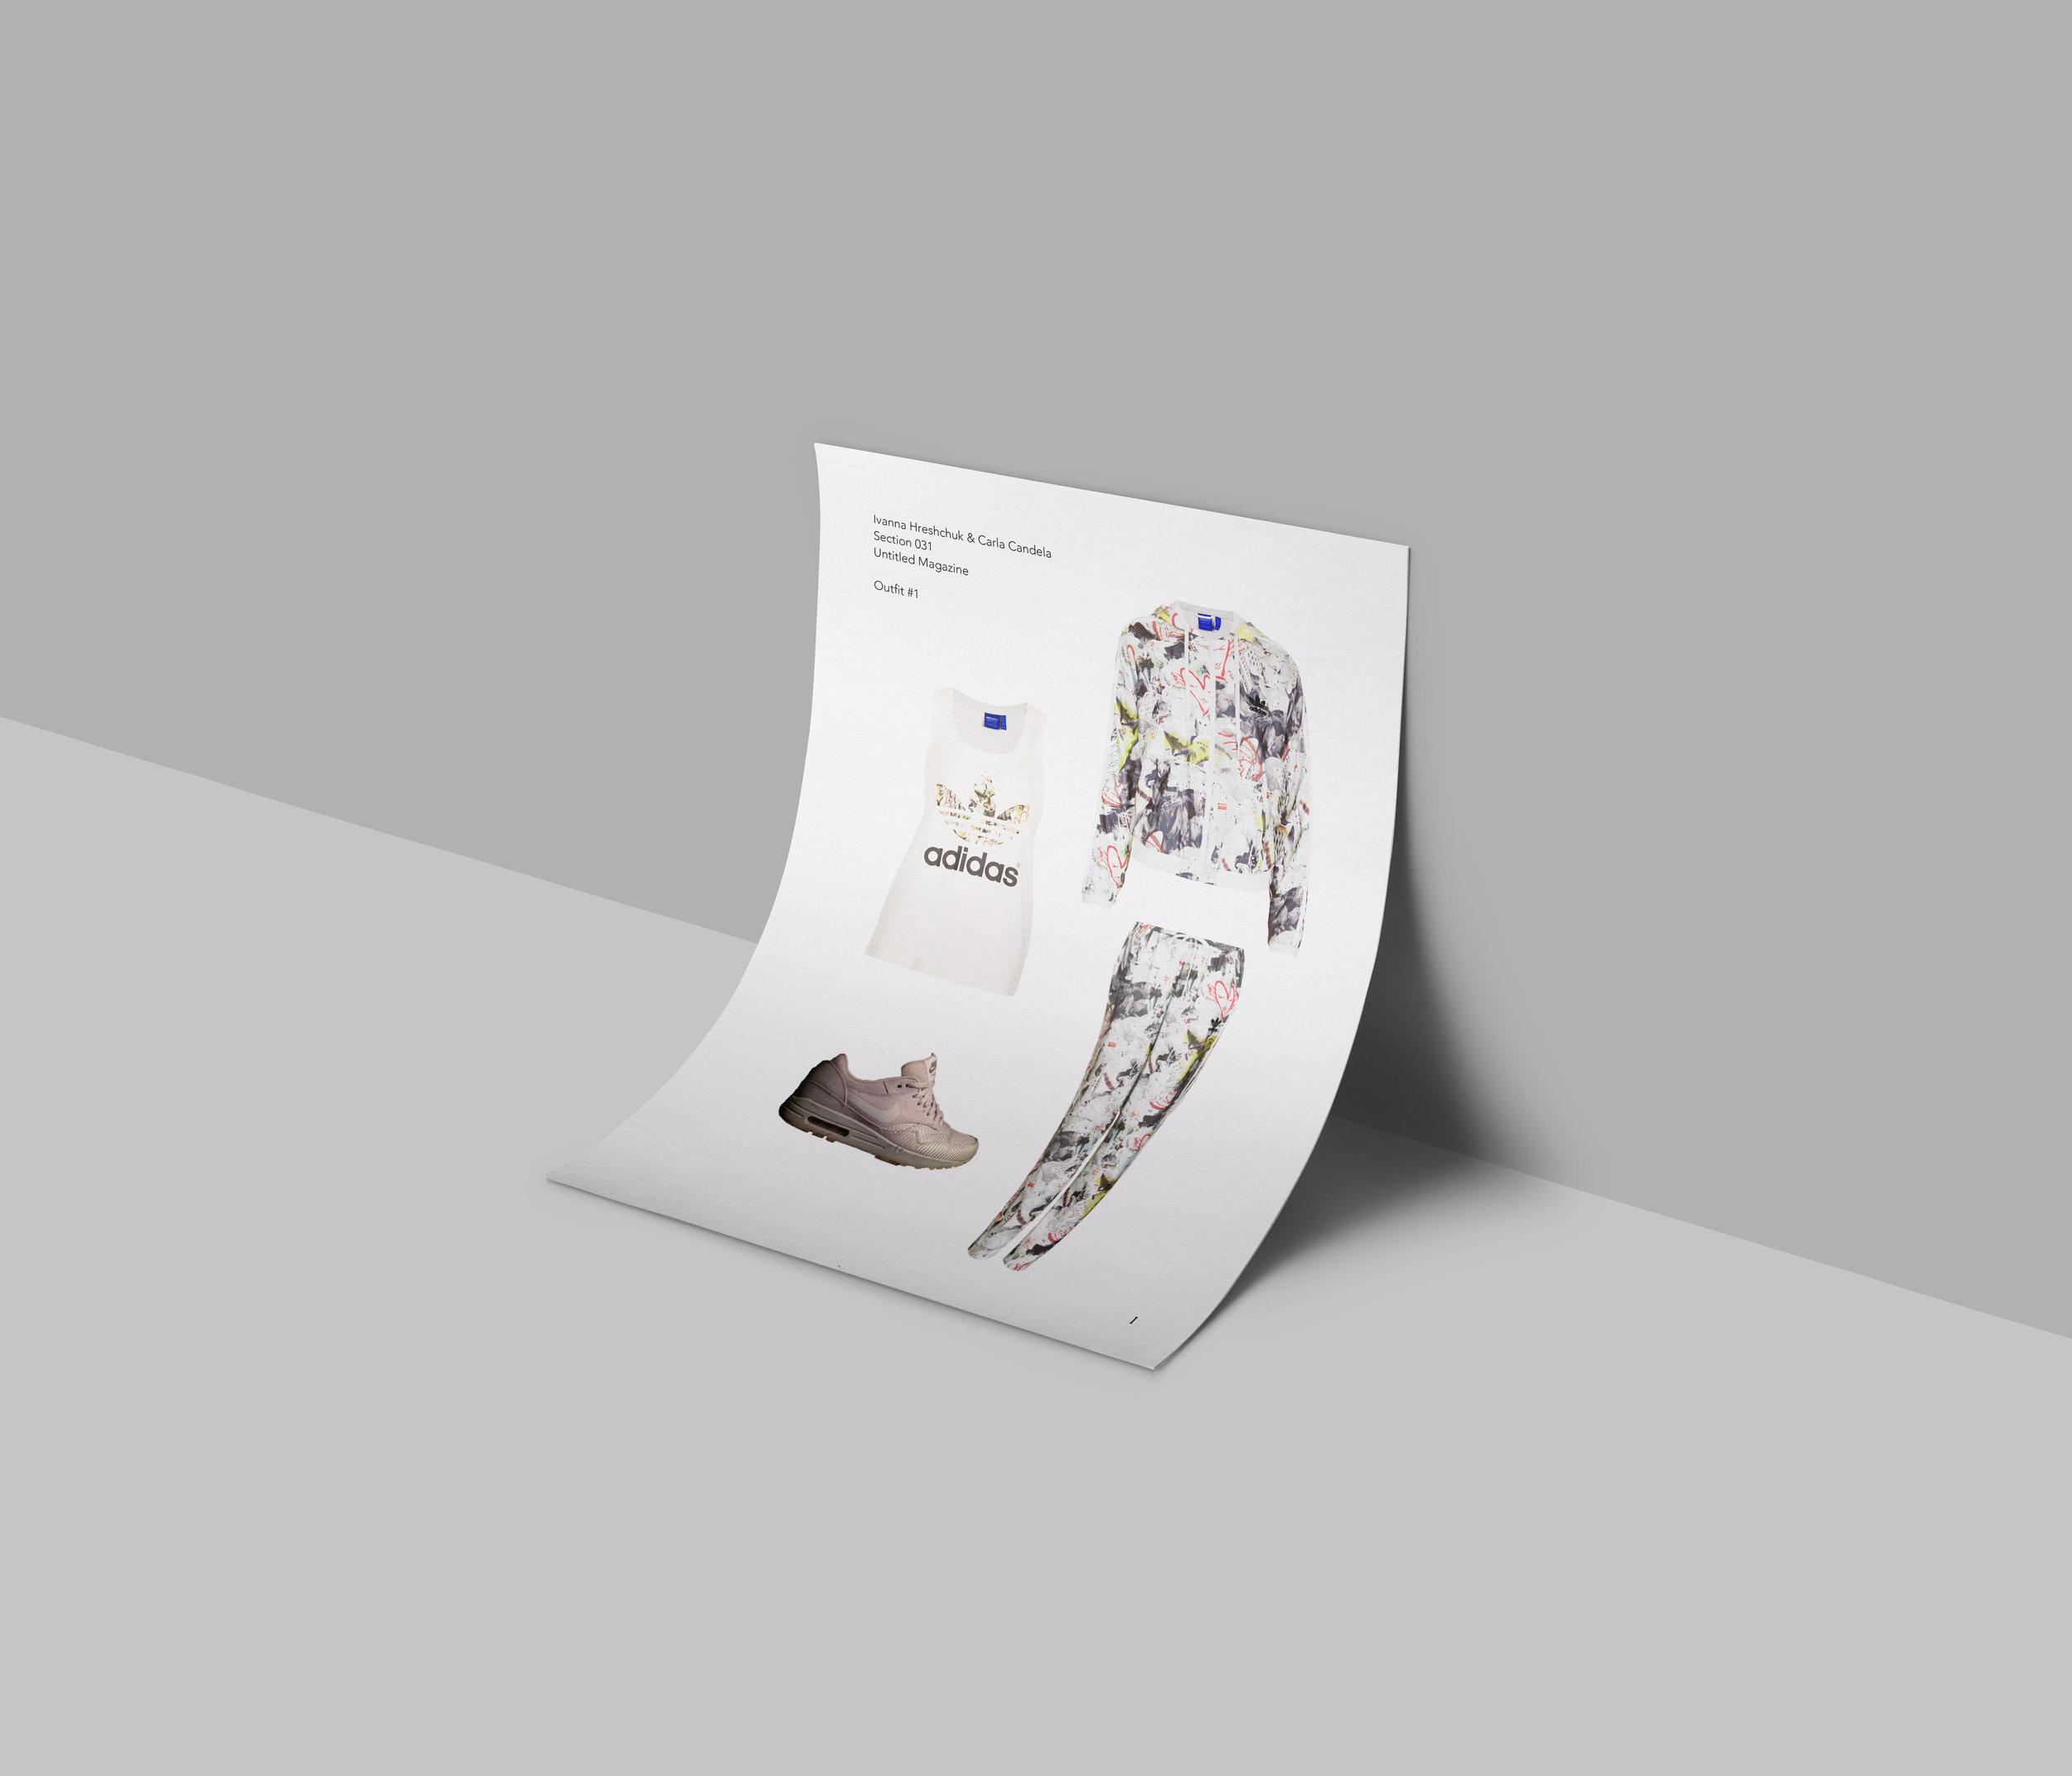 Distorted-Reality-Ivanna-Process-1.jpg